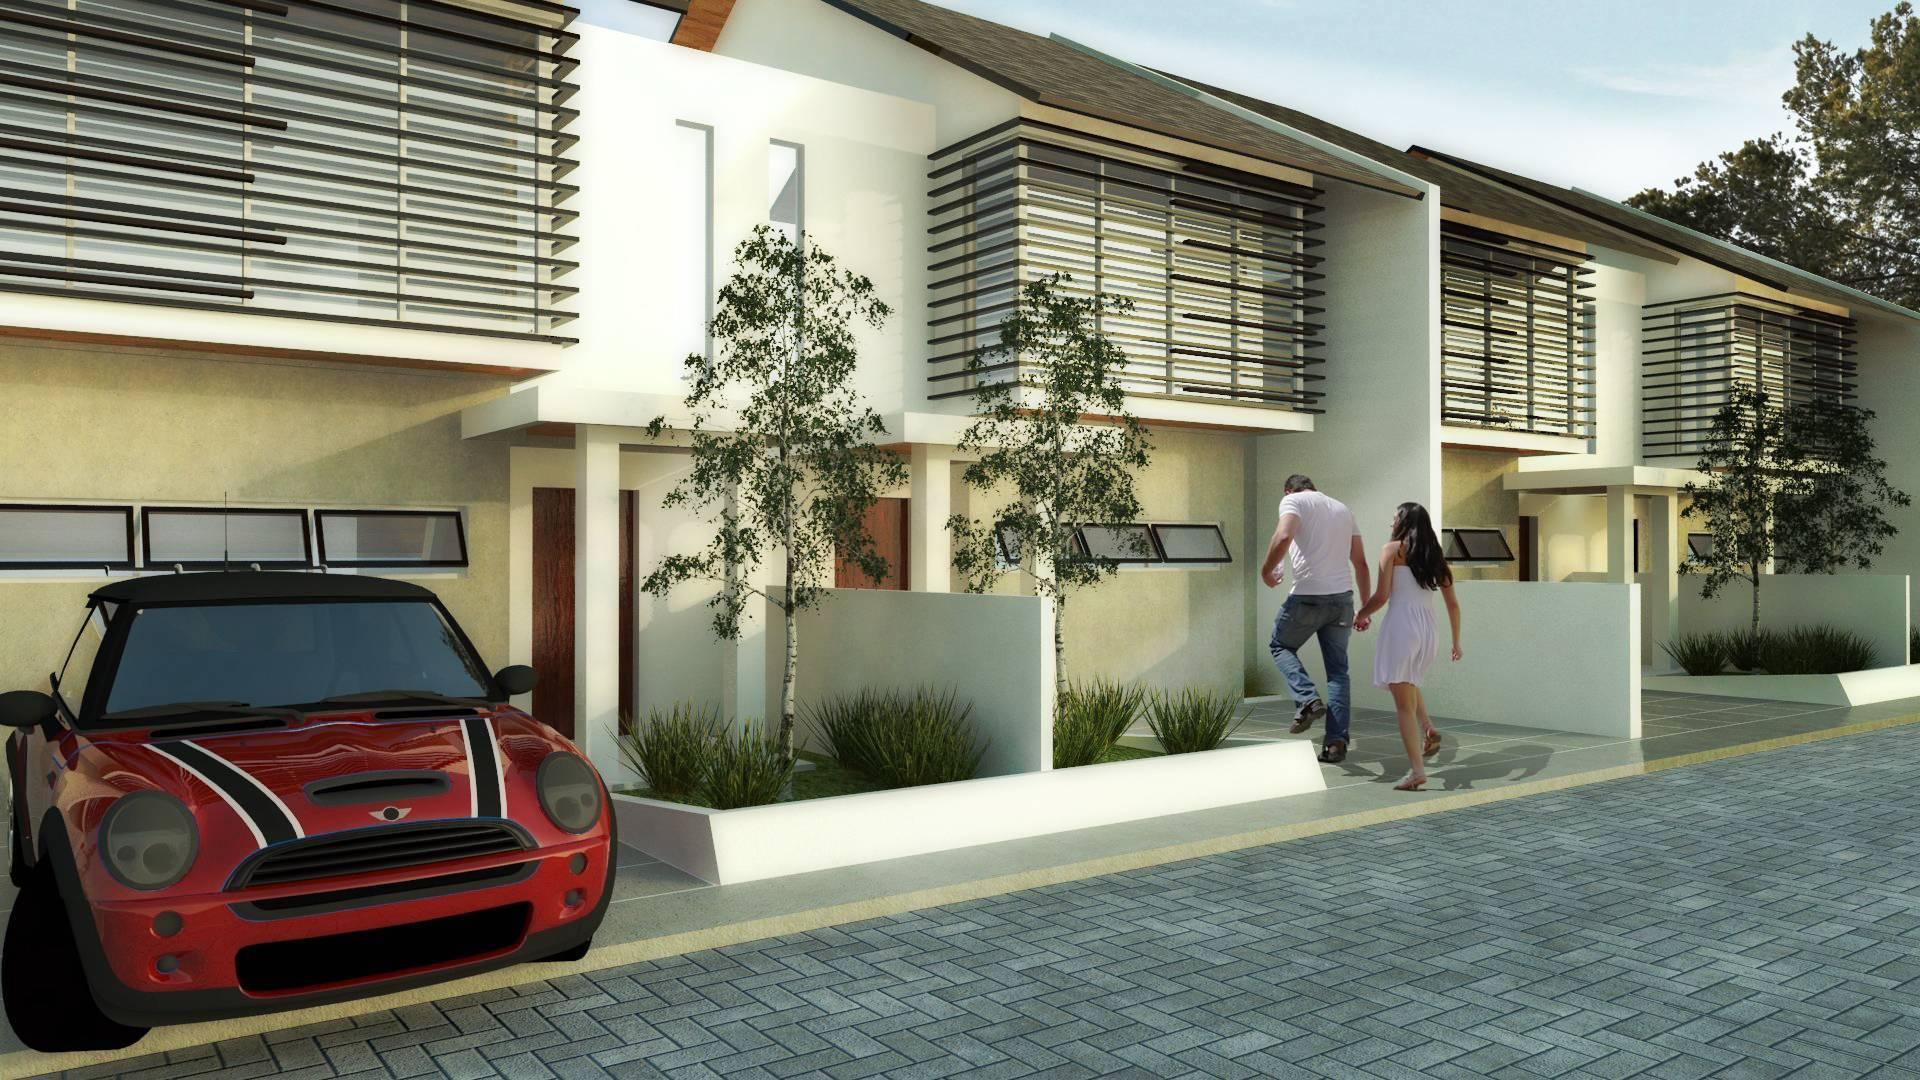 Snrg Studio Bintaro Premium Cluster Bintaro, Tangerang Selatan Bintaro, Tangerang Selatan Perspective-B Modern  4313